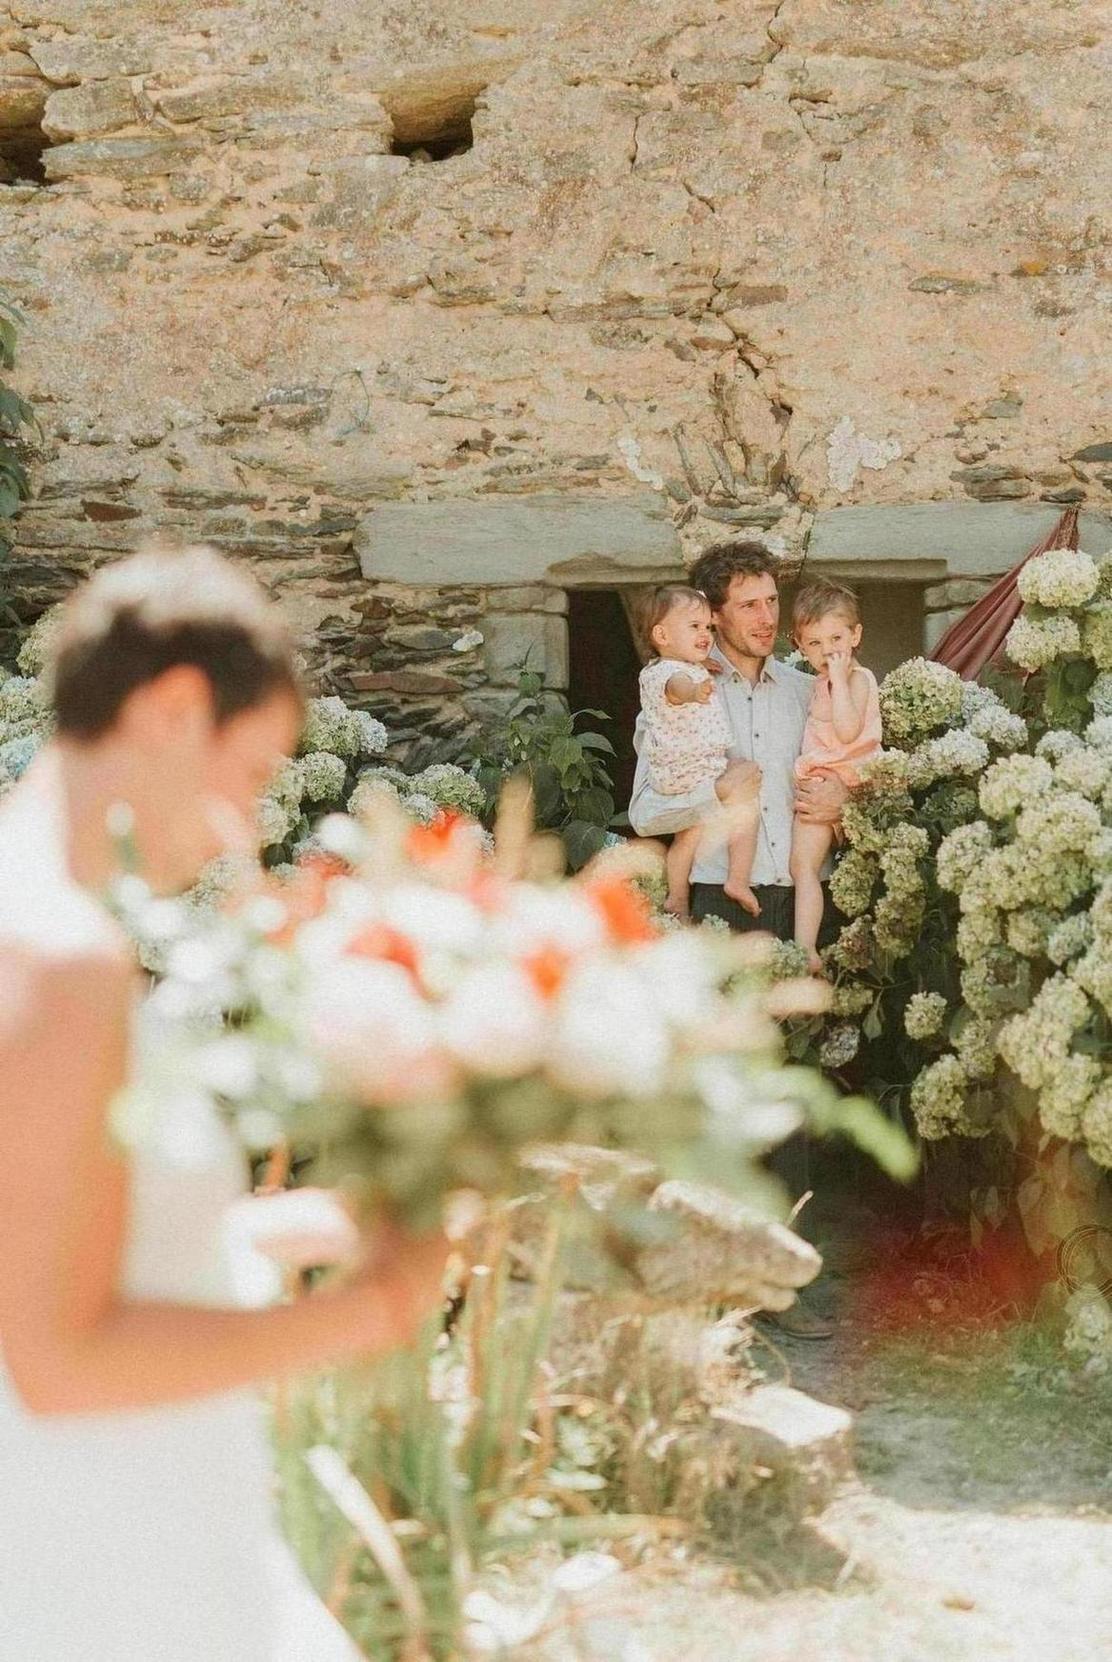 bouquet de mariee fleuriste angers chateaubriand mariage